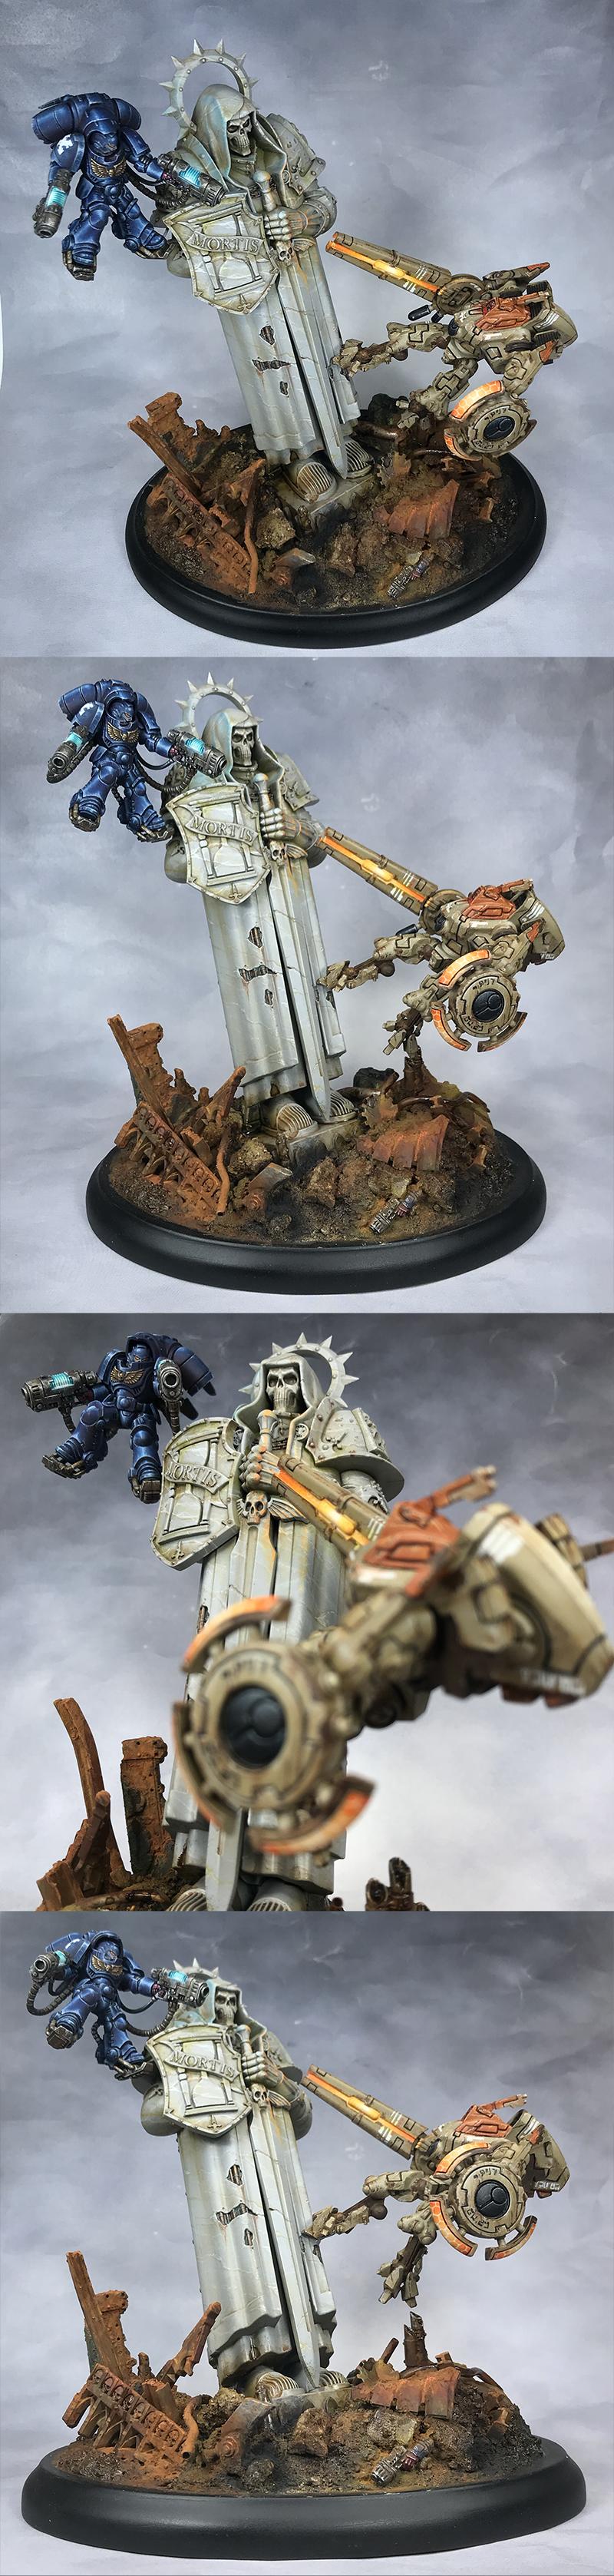 Primaris Inceptor and Tau Commander dual